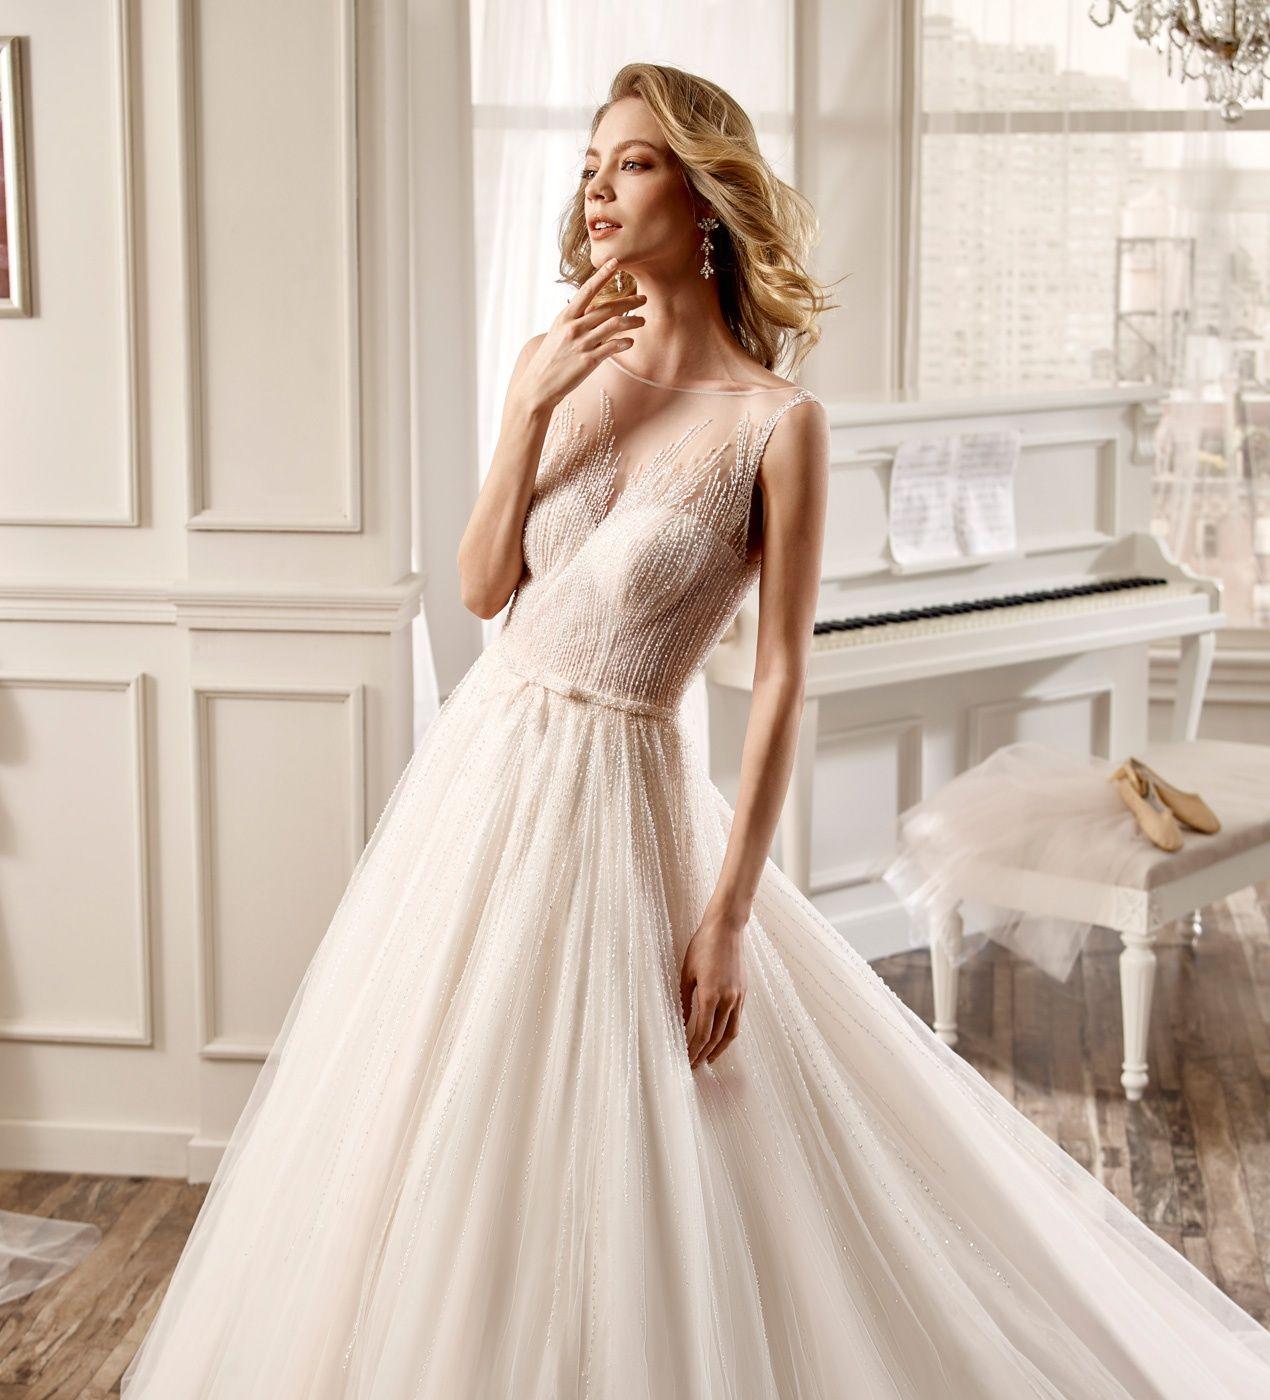 Ecru wedding dress  Wedding Dress Nicole NIAB   wedding related  Pinterest